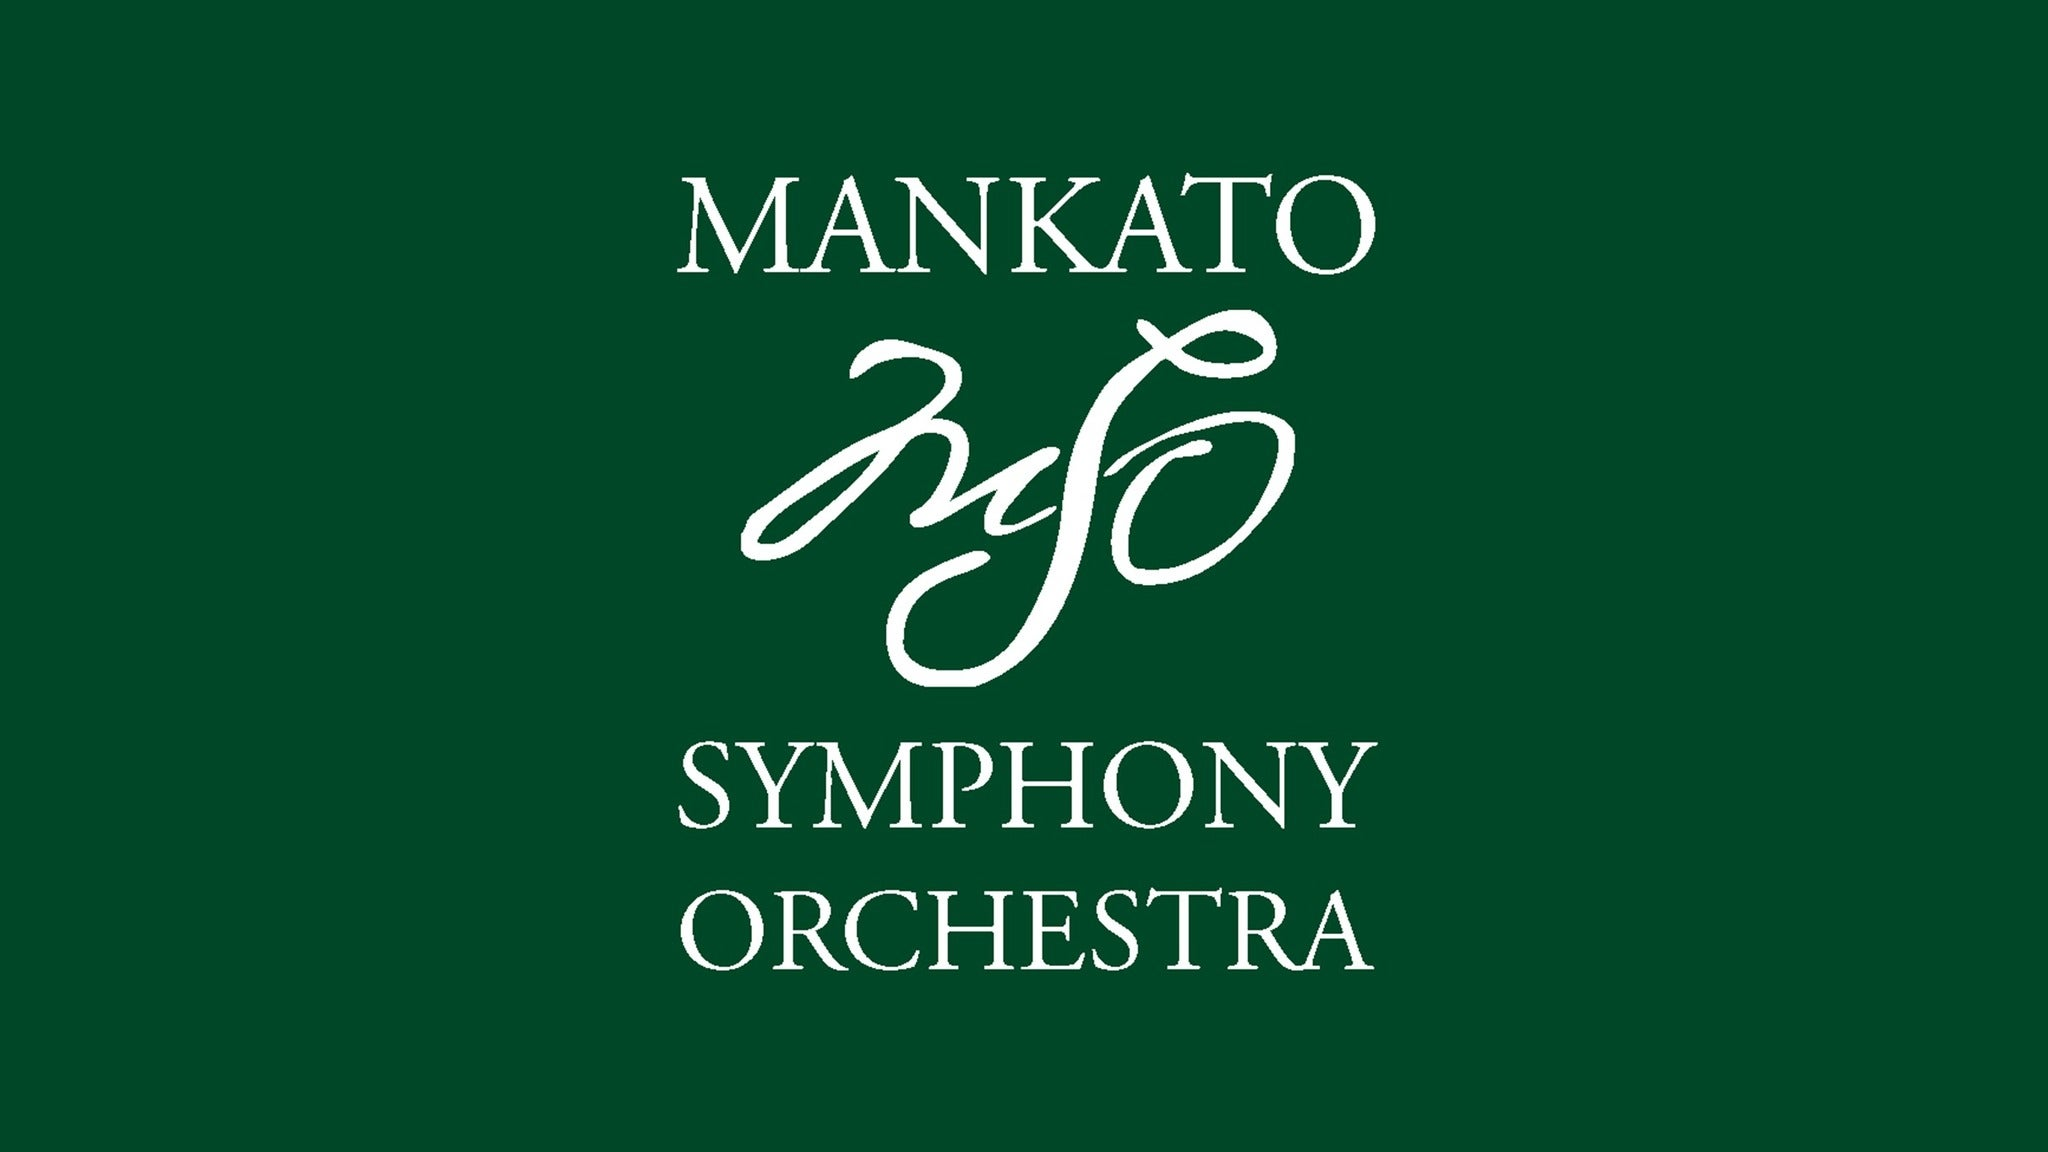 Mankato Symphony Orchestra at Verizon Wireless